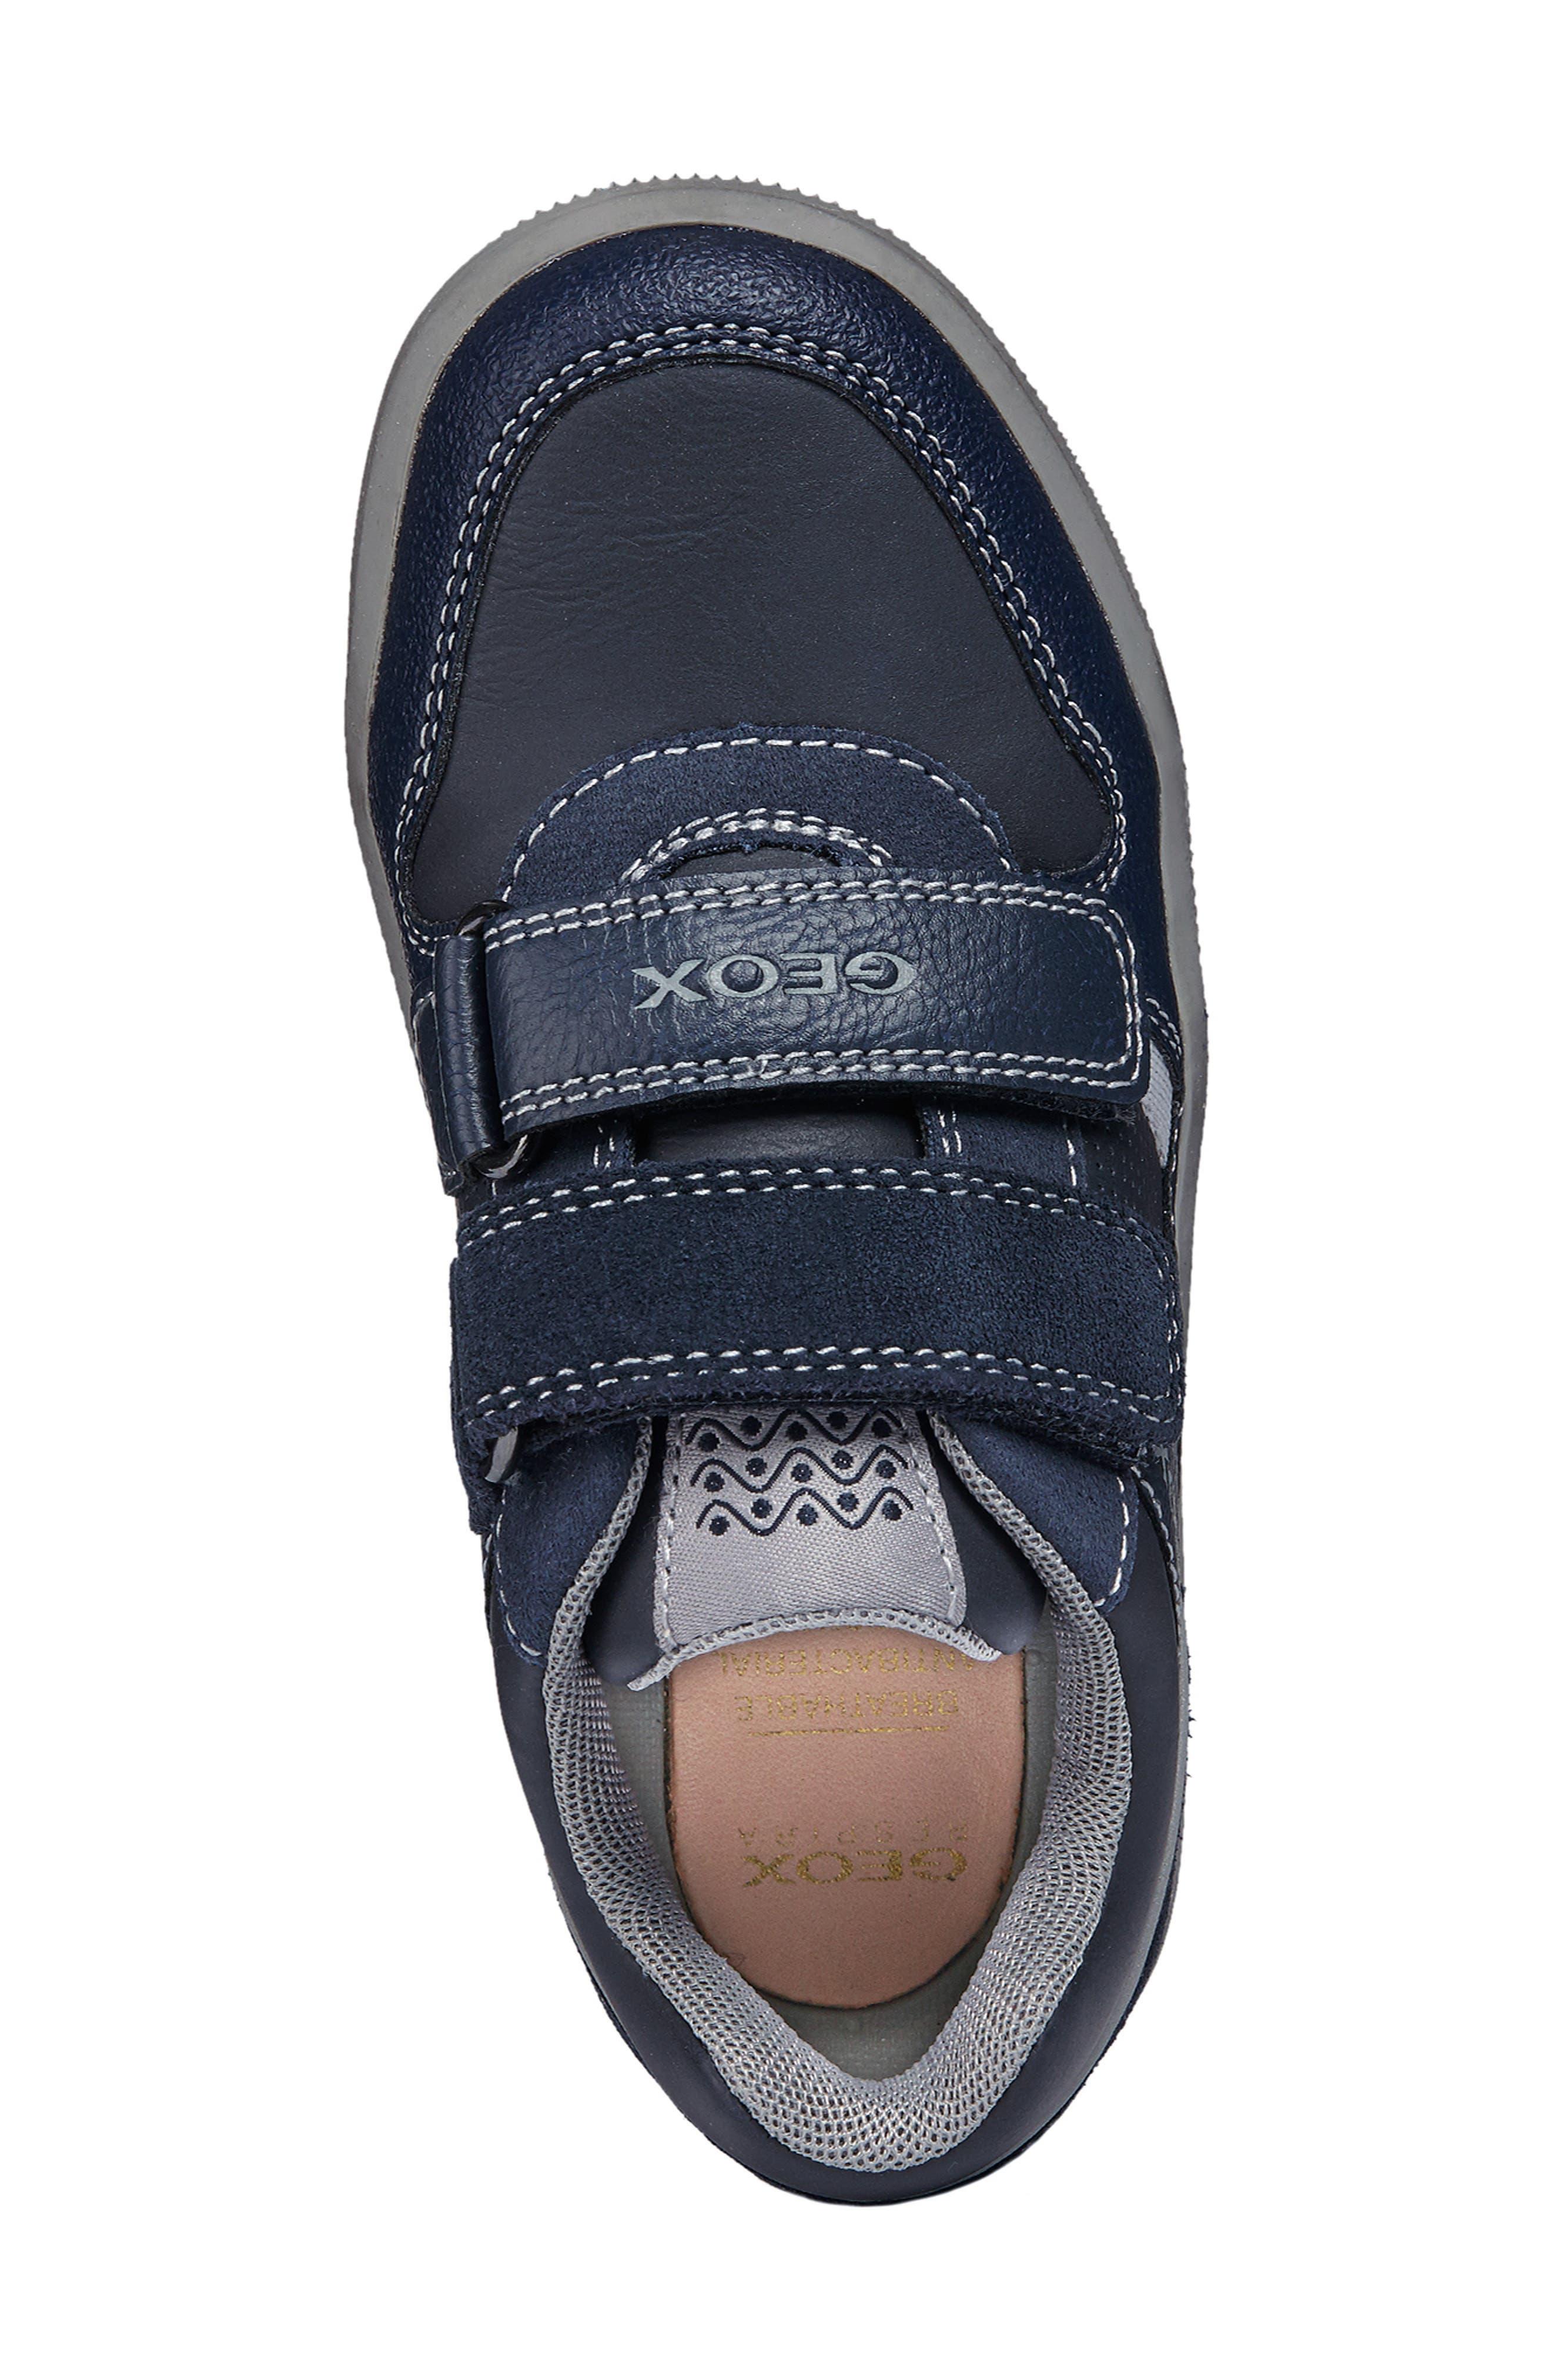 Jr Arzach Sneaker,                             Alternate thumbnail 4, color,                             Navy Blue/ Grey